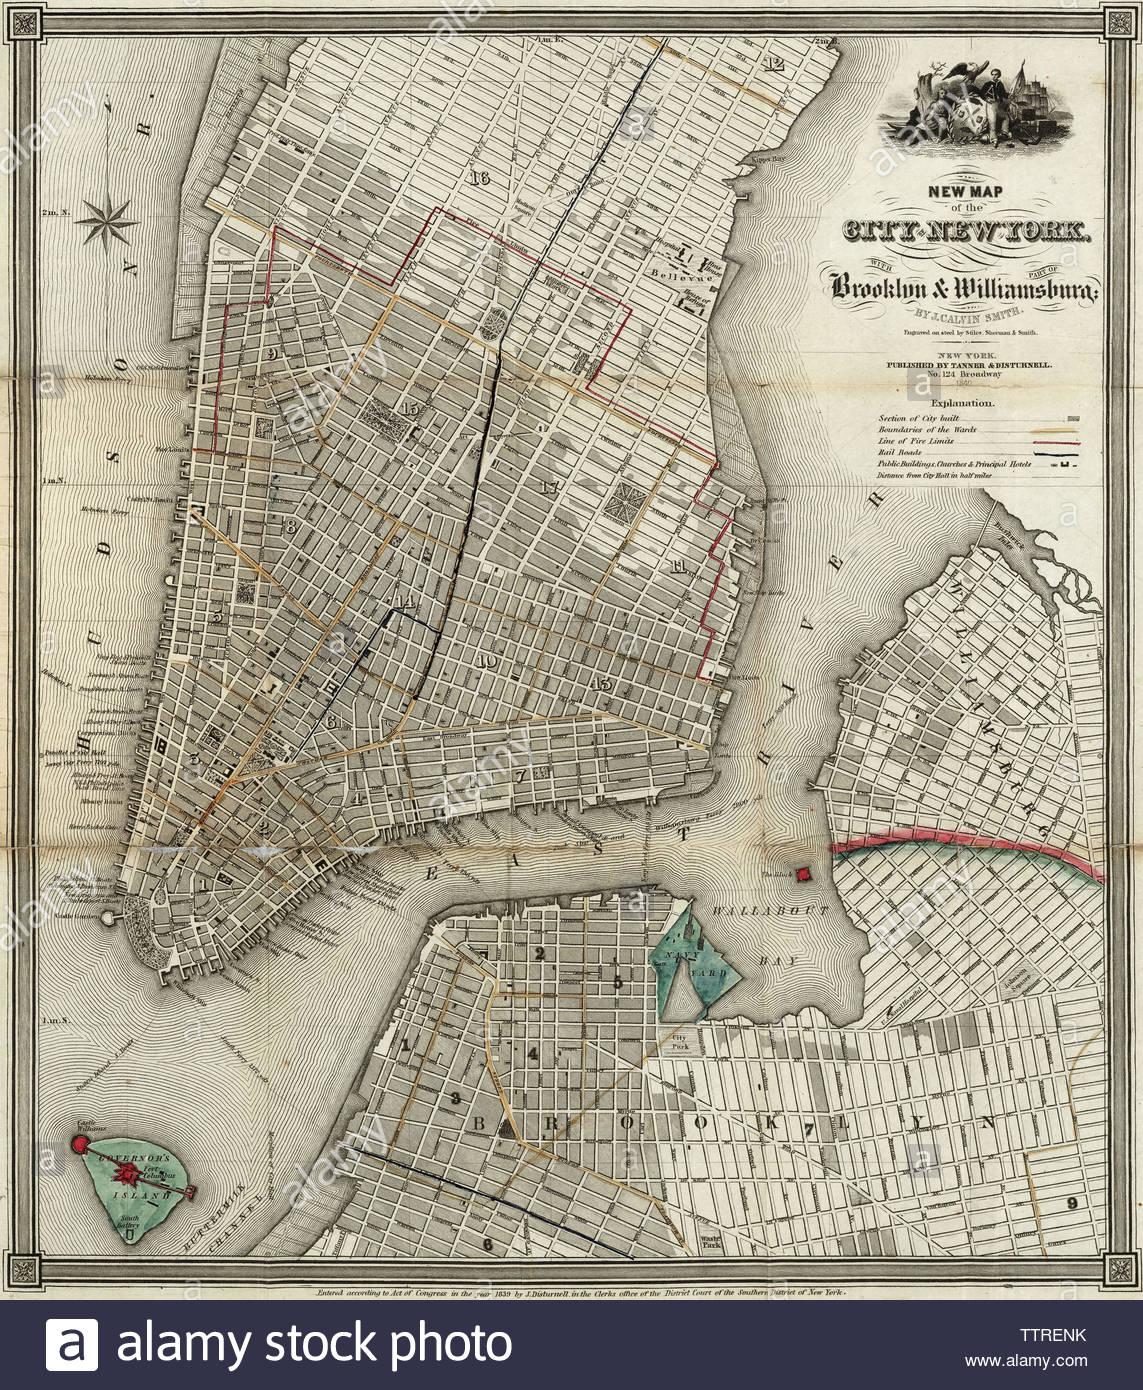 Ny Subway Map Lower Manhattanbrooklyn.Manhattan Map Stock Photos Manhattan Map Stock Images Alamy